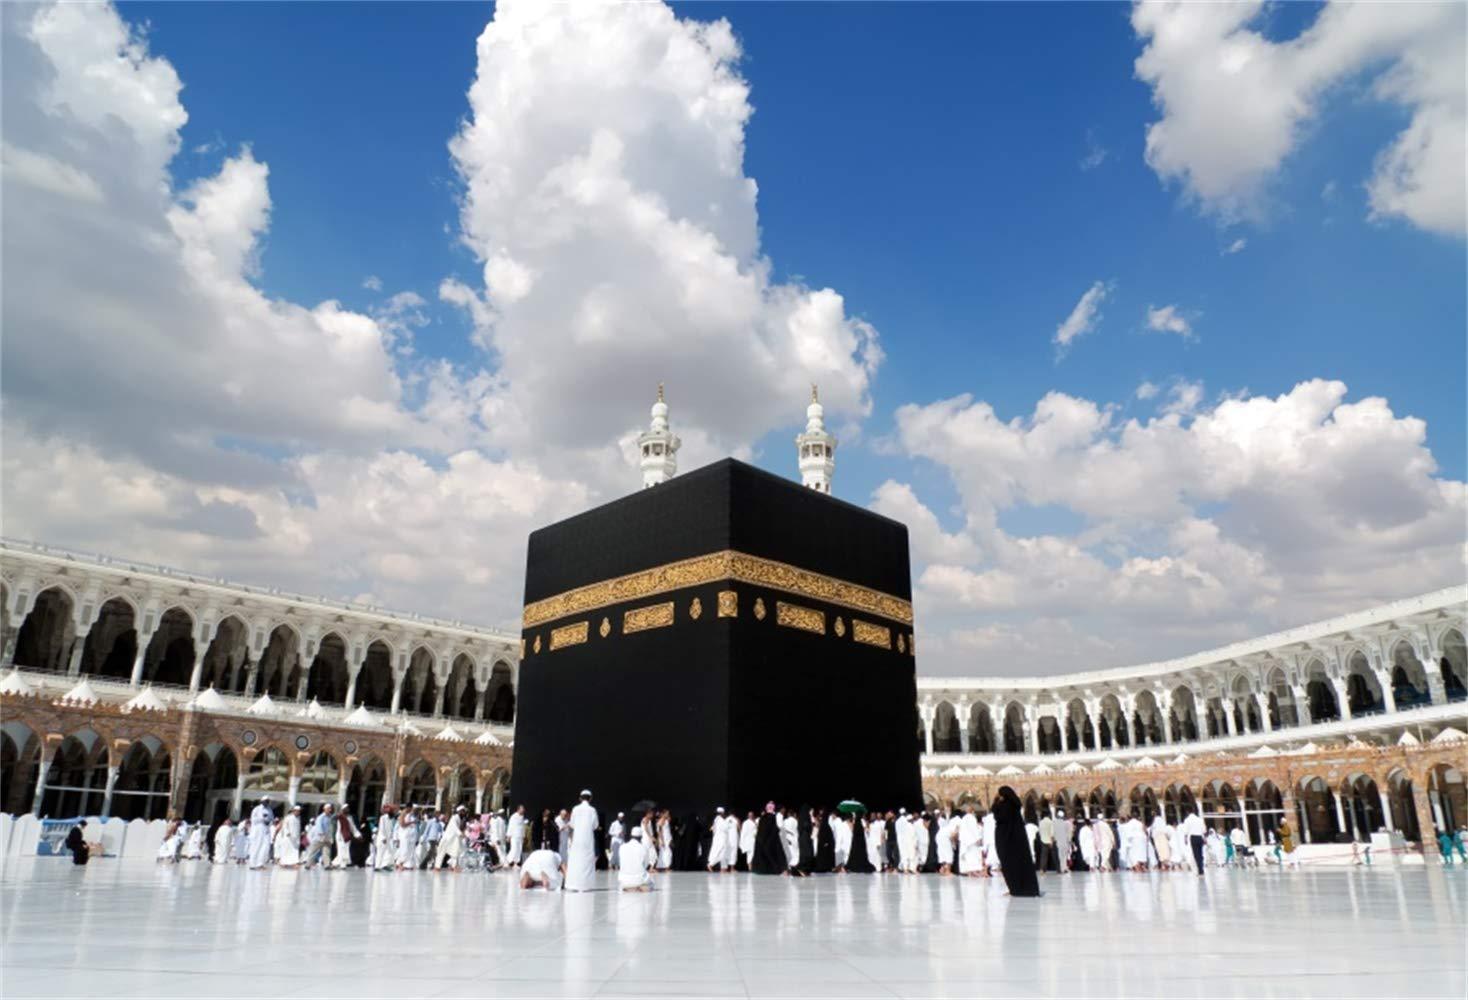 Amazoncom LFEEY 12x10ft Vinyl Kaaba in Mecca Saudi Arabia 1468x1000